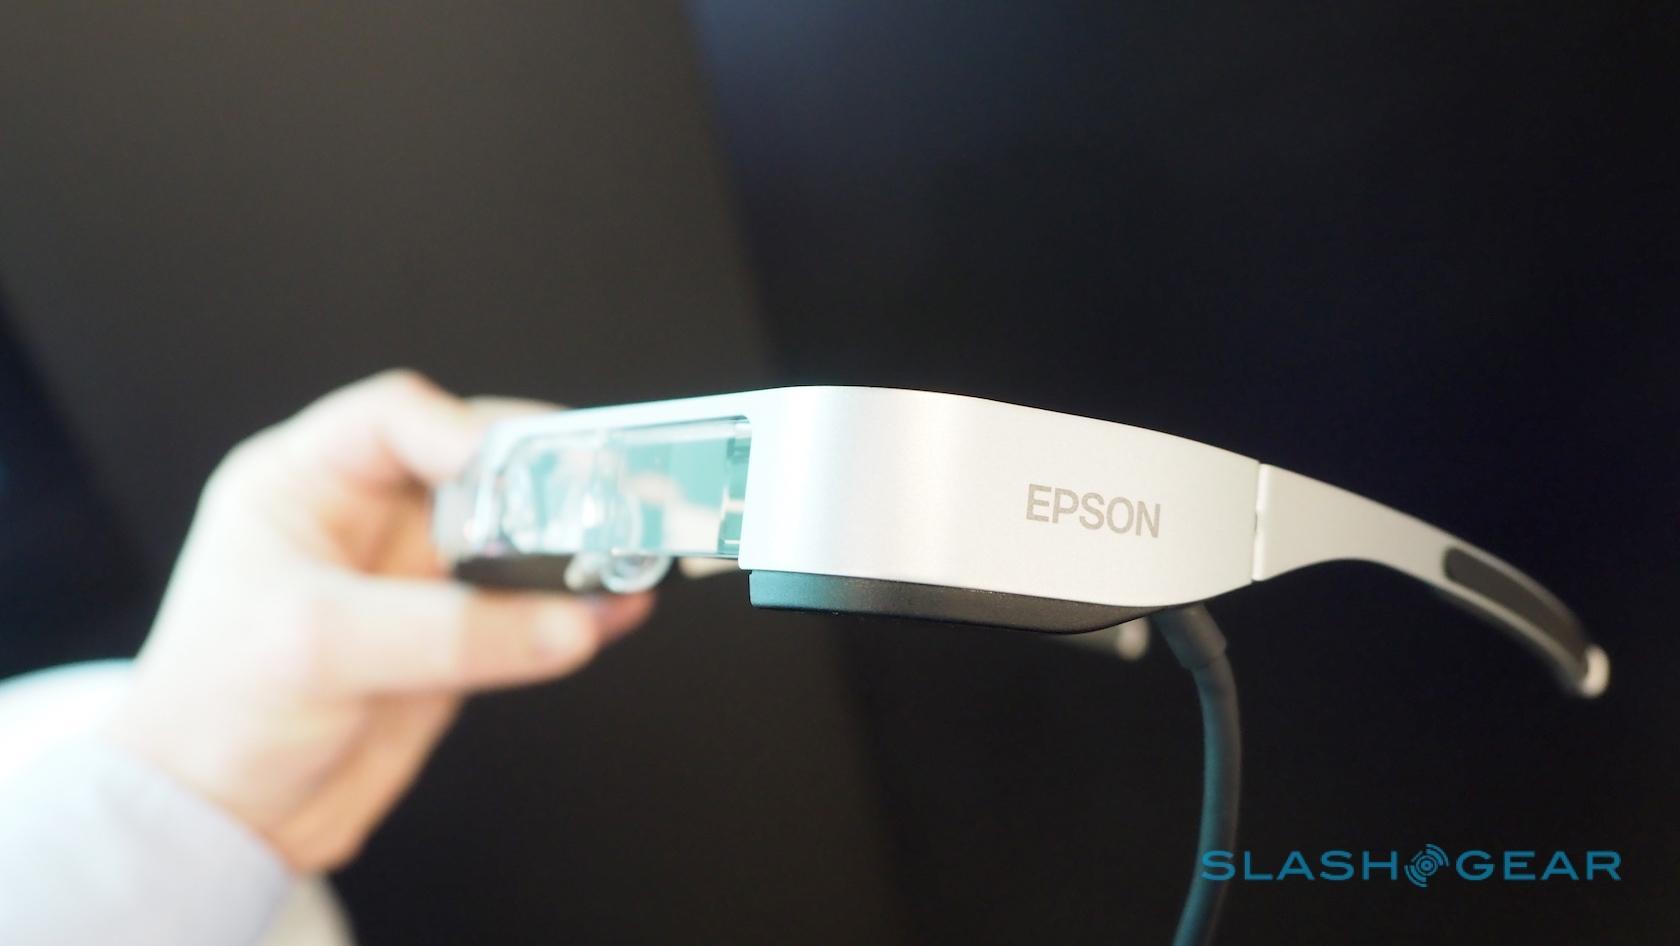 epson-bt-300-hands-on-sg-3